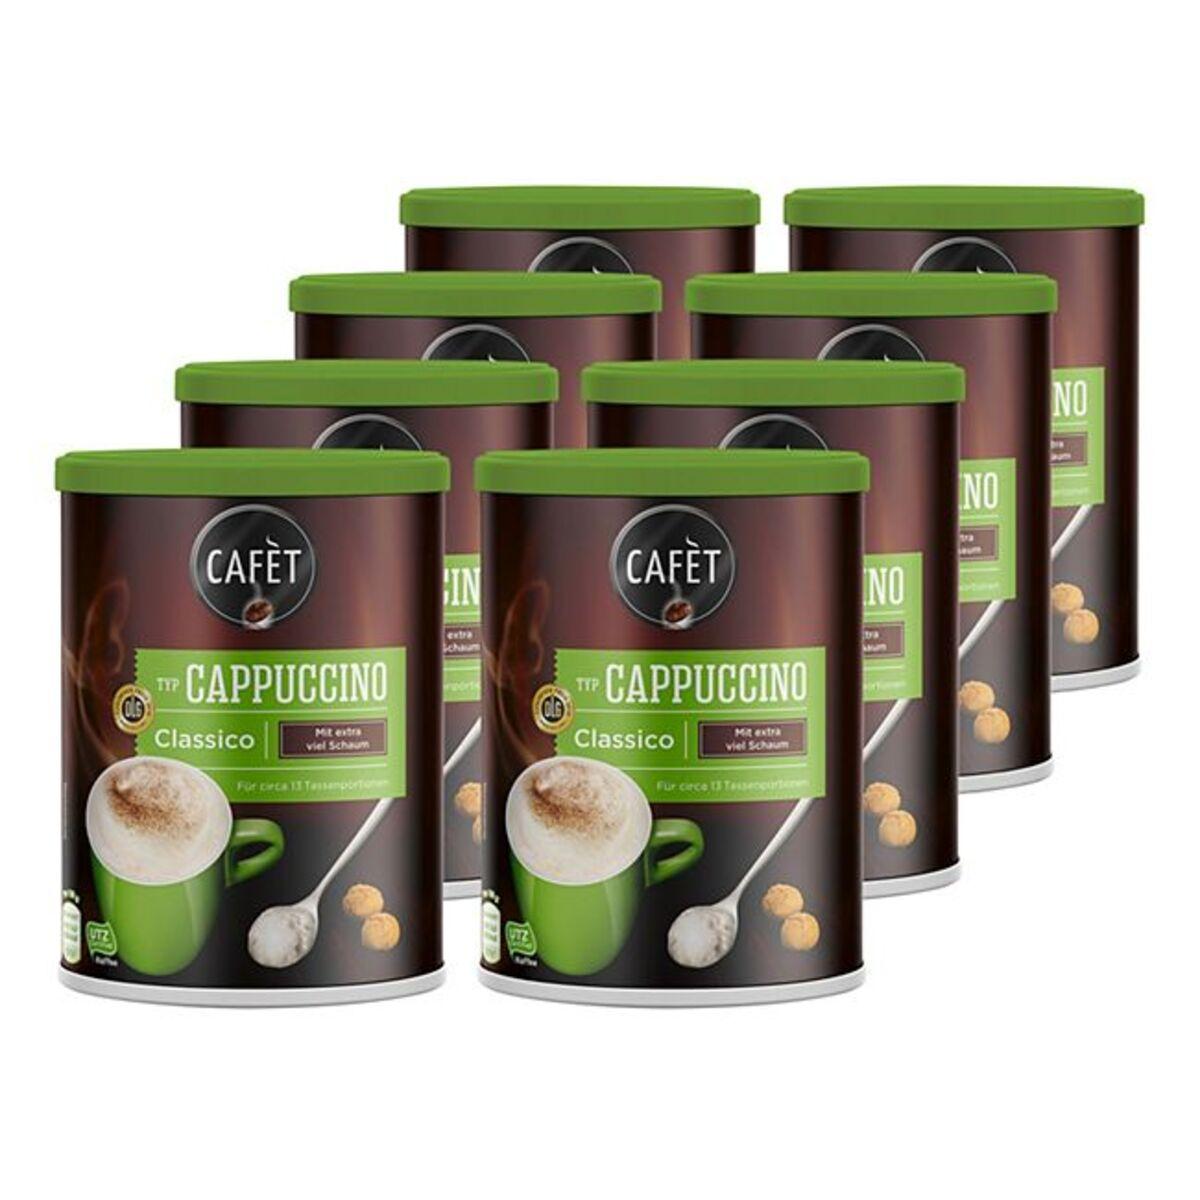 Bild 1 von Cafet Cappuccino Classico 200 g, 8er Pack